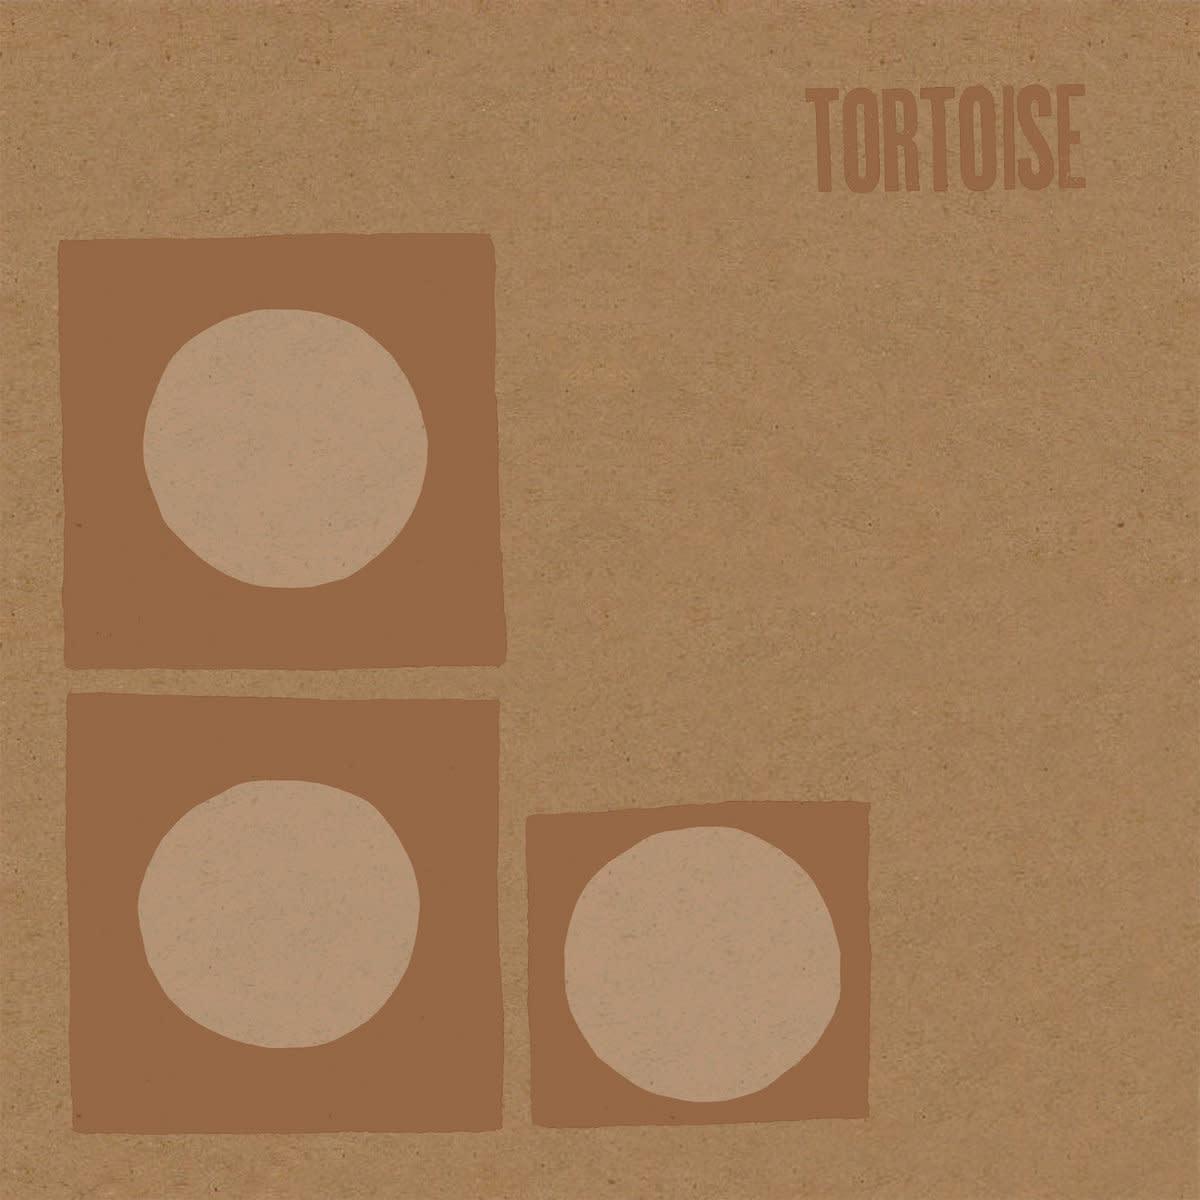 Tortoise • Tortoise-1